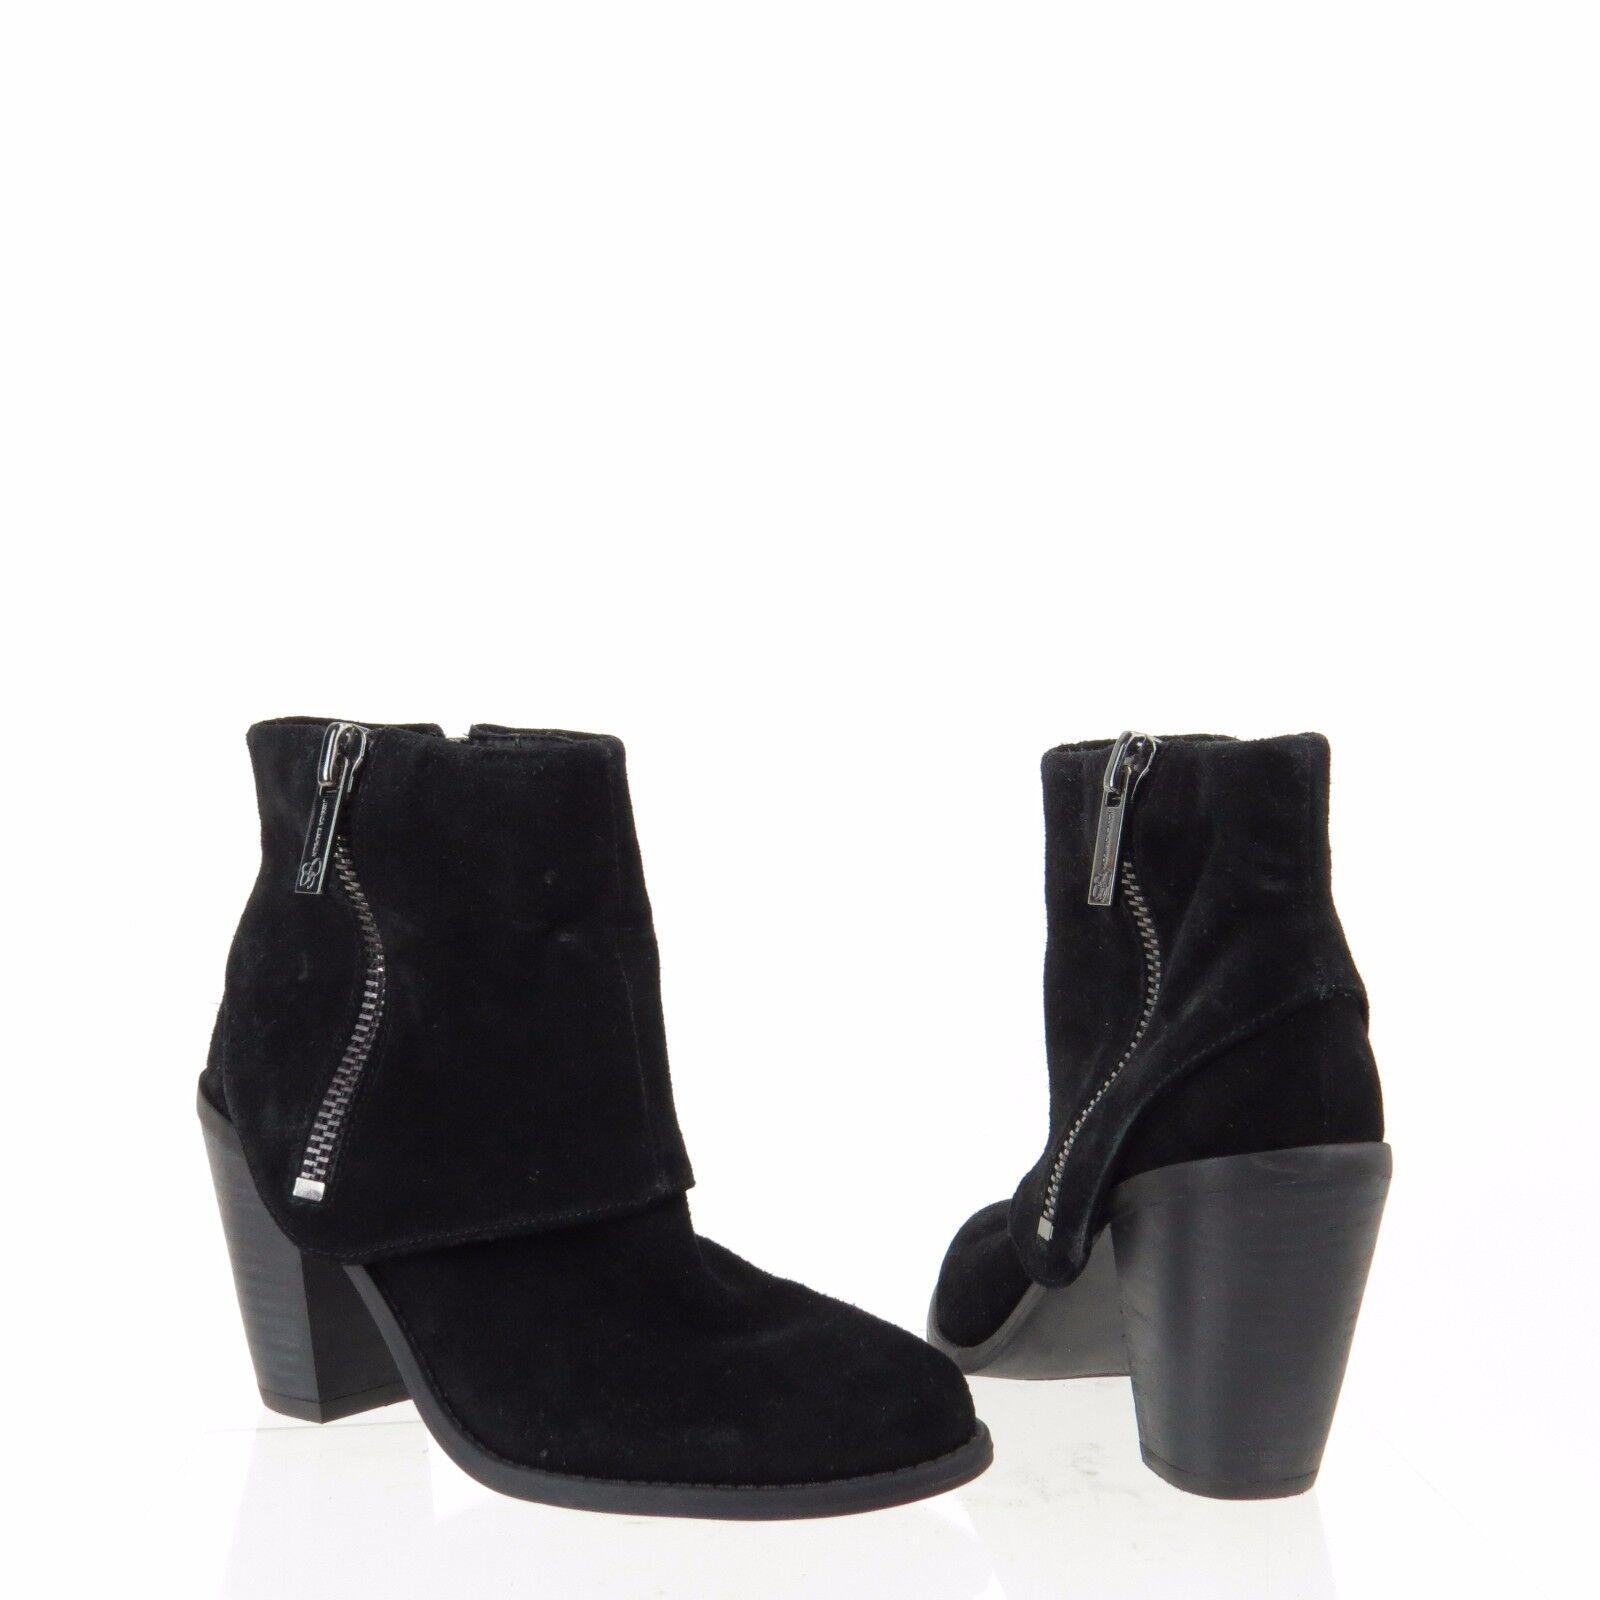 Womens Jessica Simpson Caufield Shoes Black Suede Round Toe Ankle Boots Sz 5.5 M